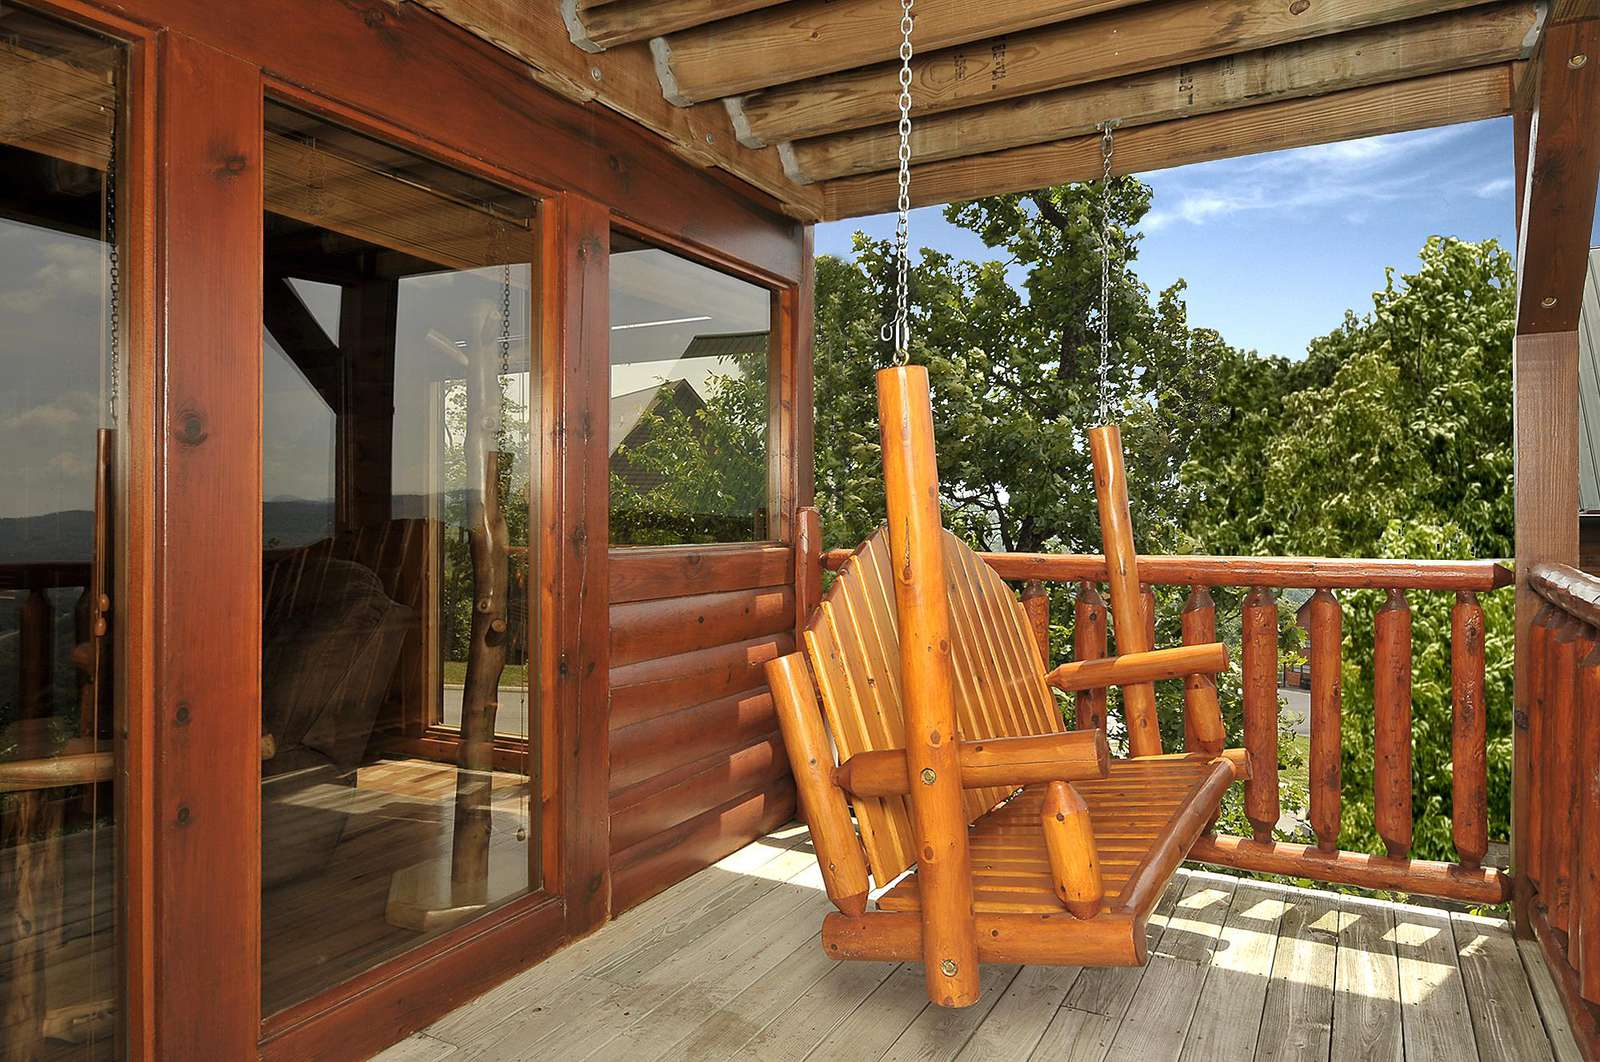 Bench Swing on Porch